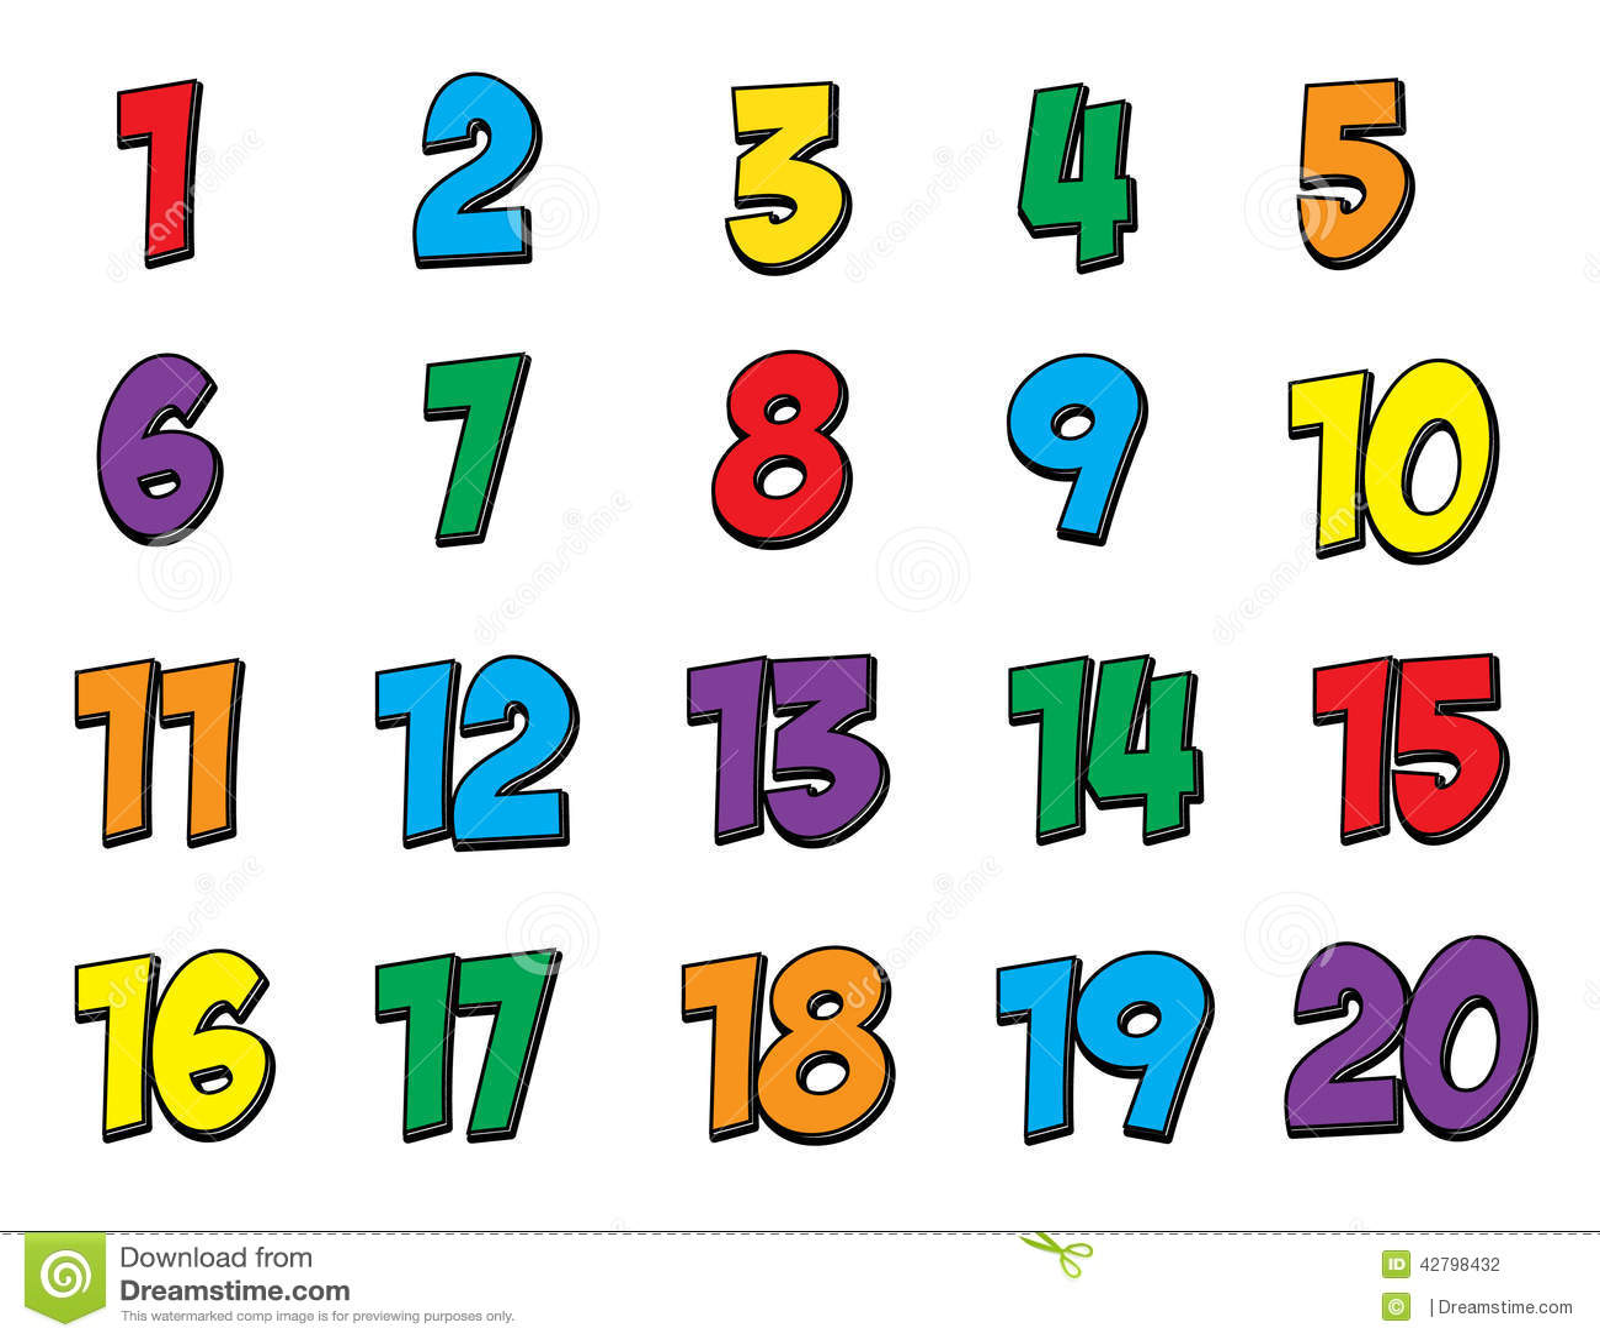 Colorful Number Set 1-20 Stock Illustration - Image: 42798432